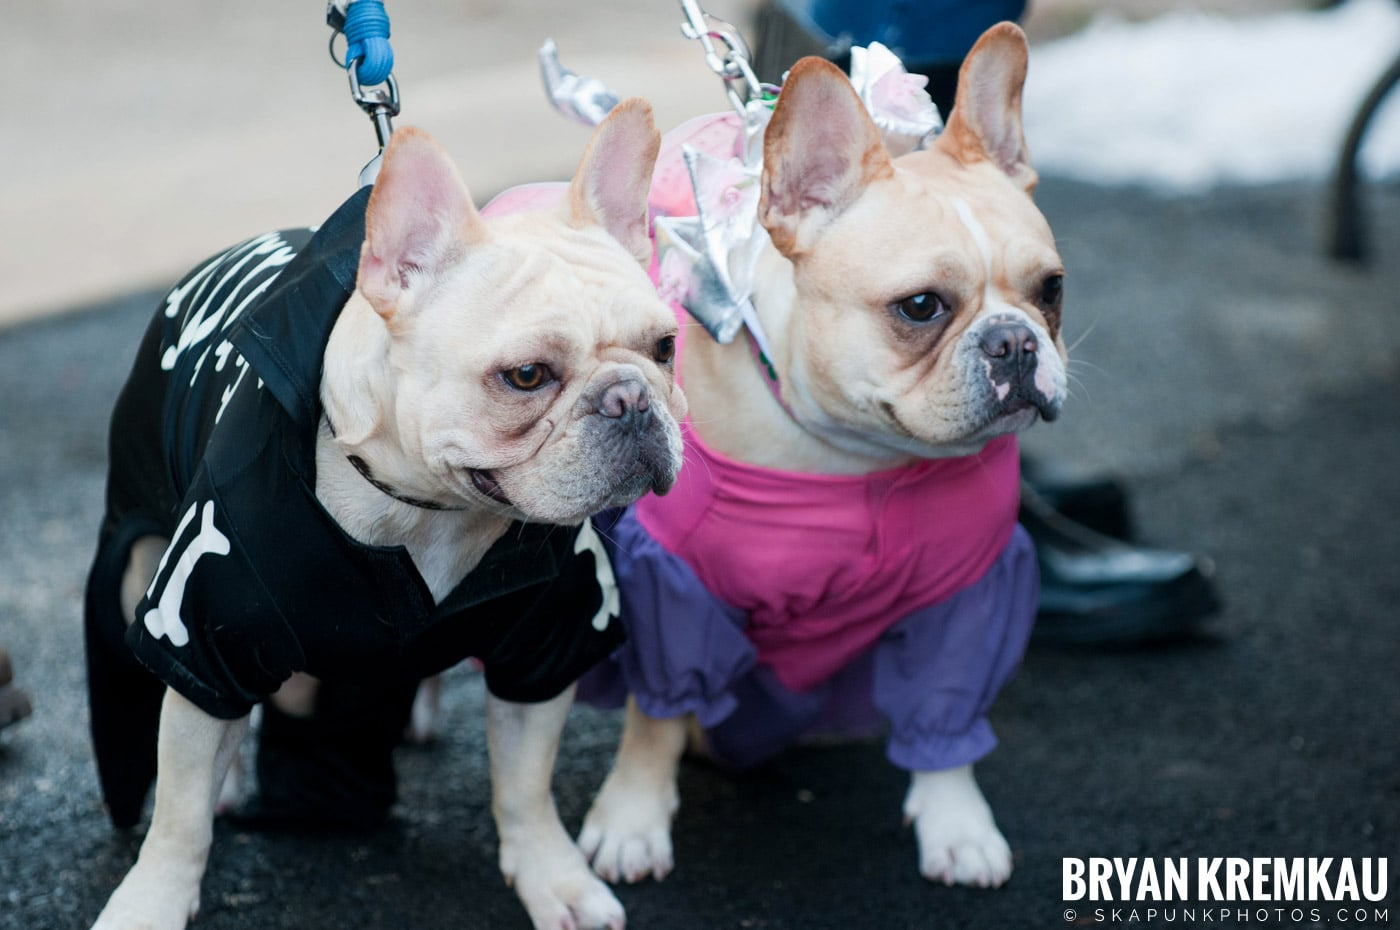 Paulus Hook Halloween Pet Parade 2011 @ Jersey City, NJ - 10.30.11 (51)